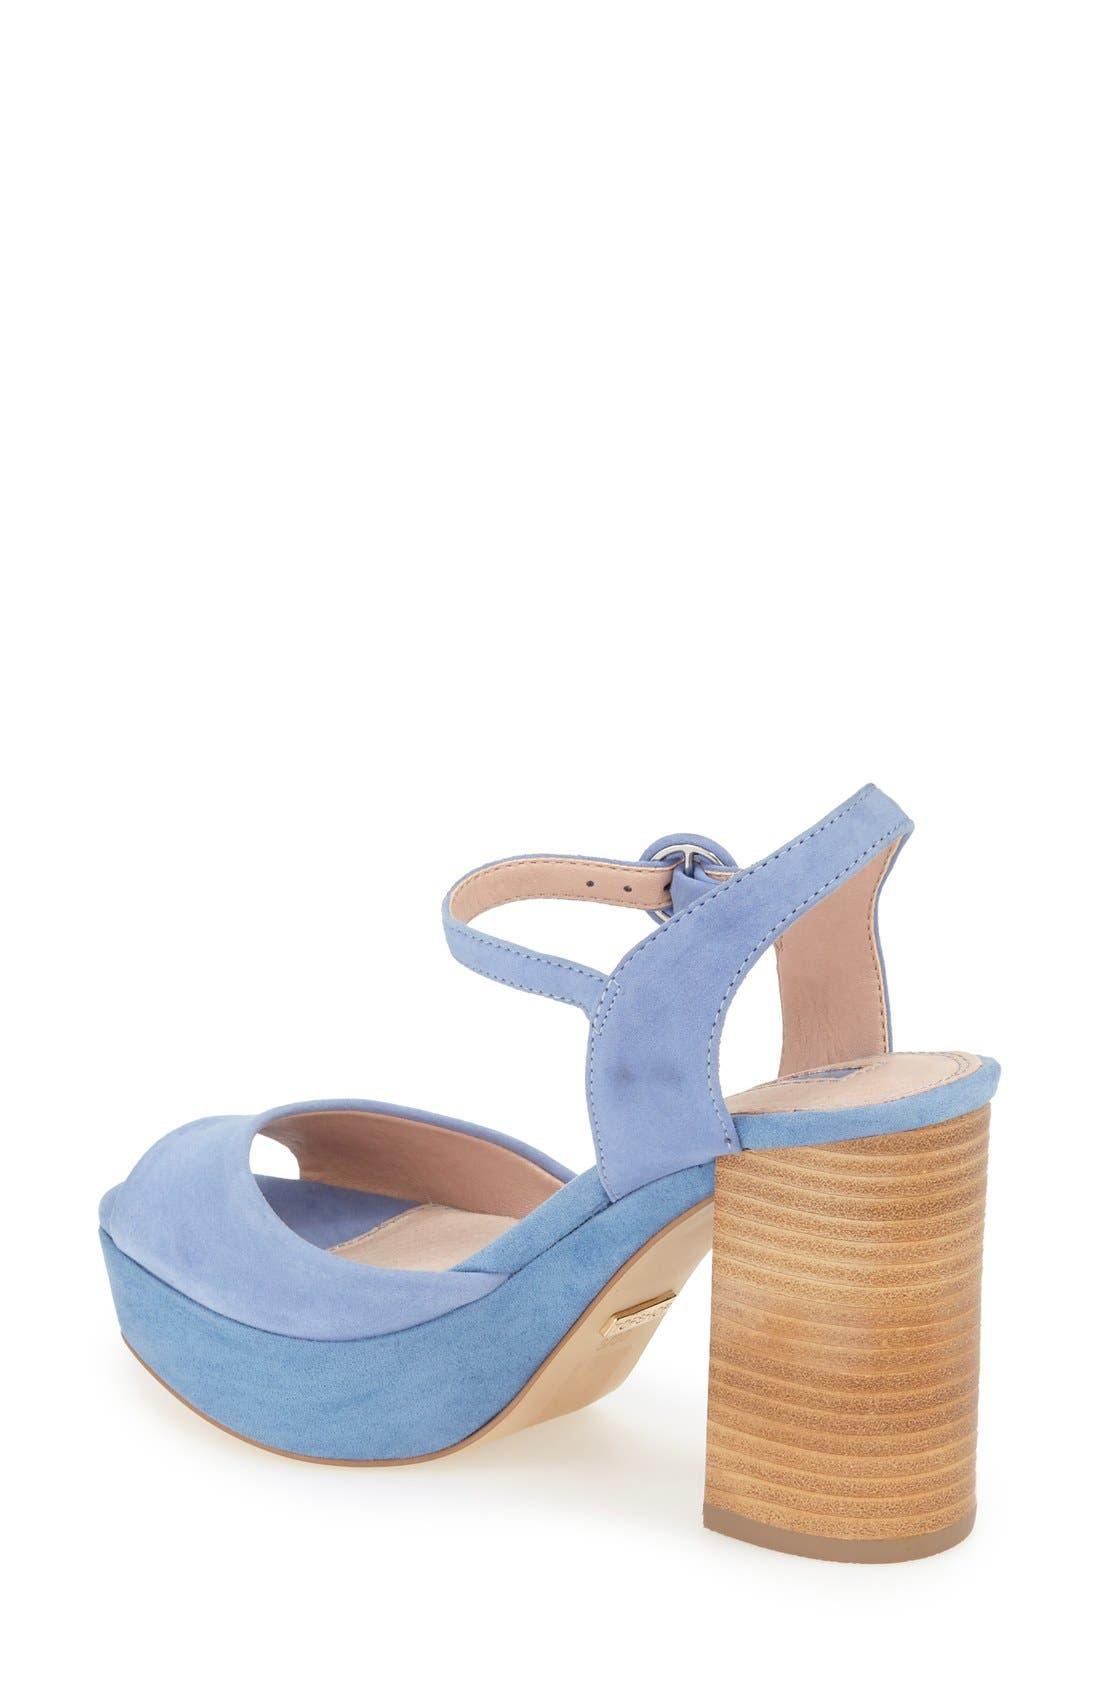 'Lana' Chunky Platform Sandal,                             Alternate thumbnail 2, color,                             Blue